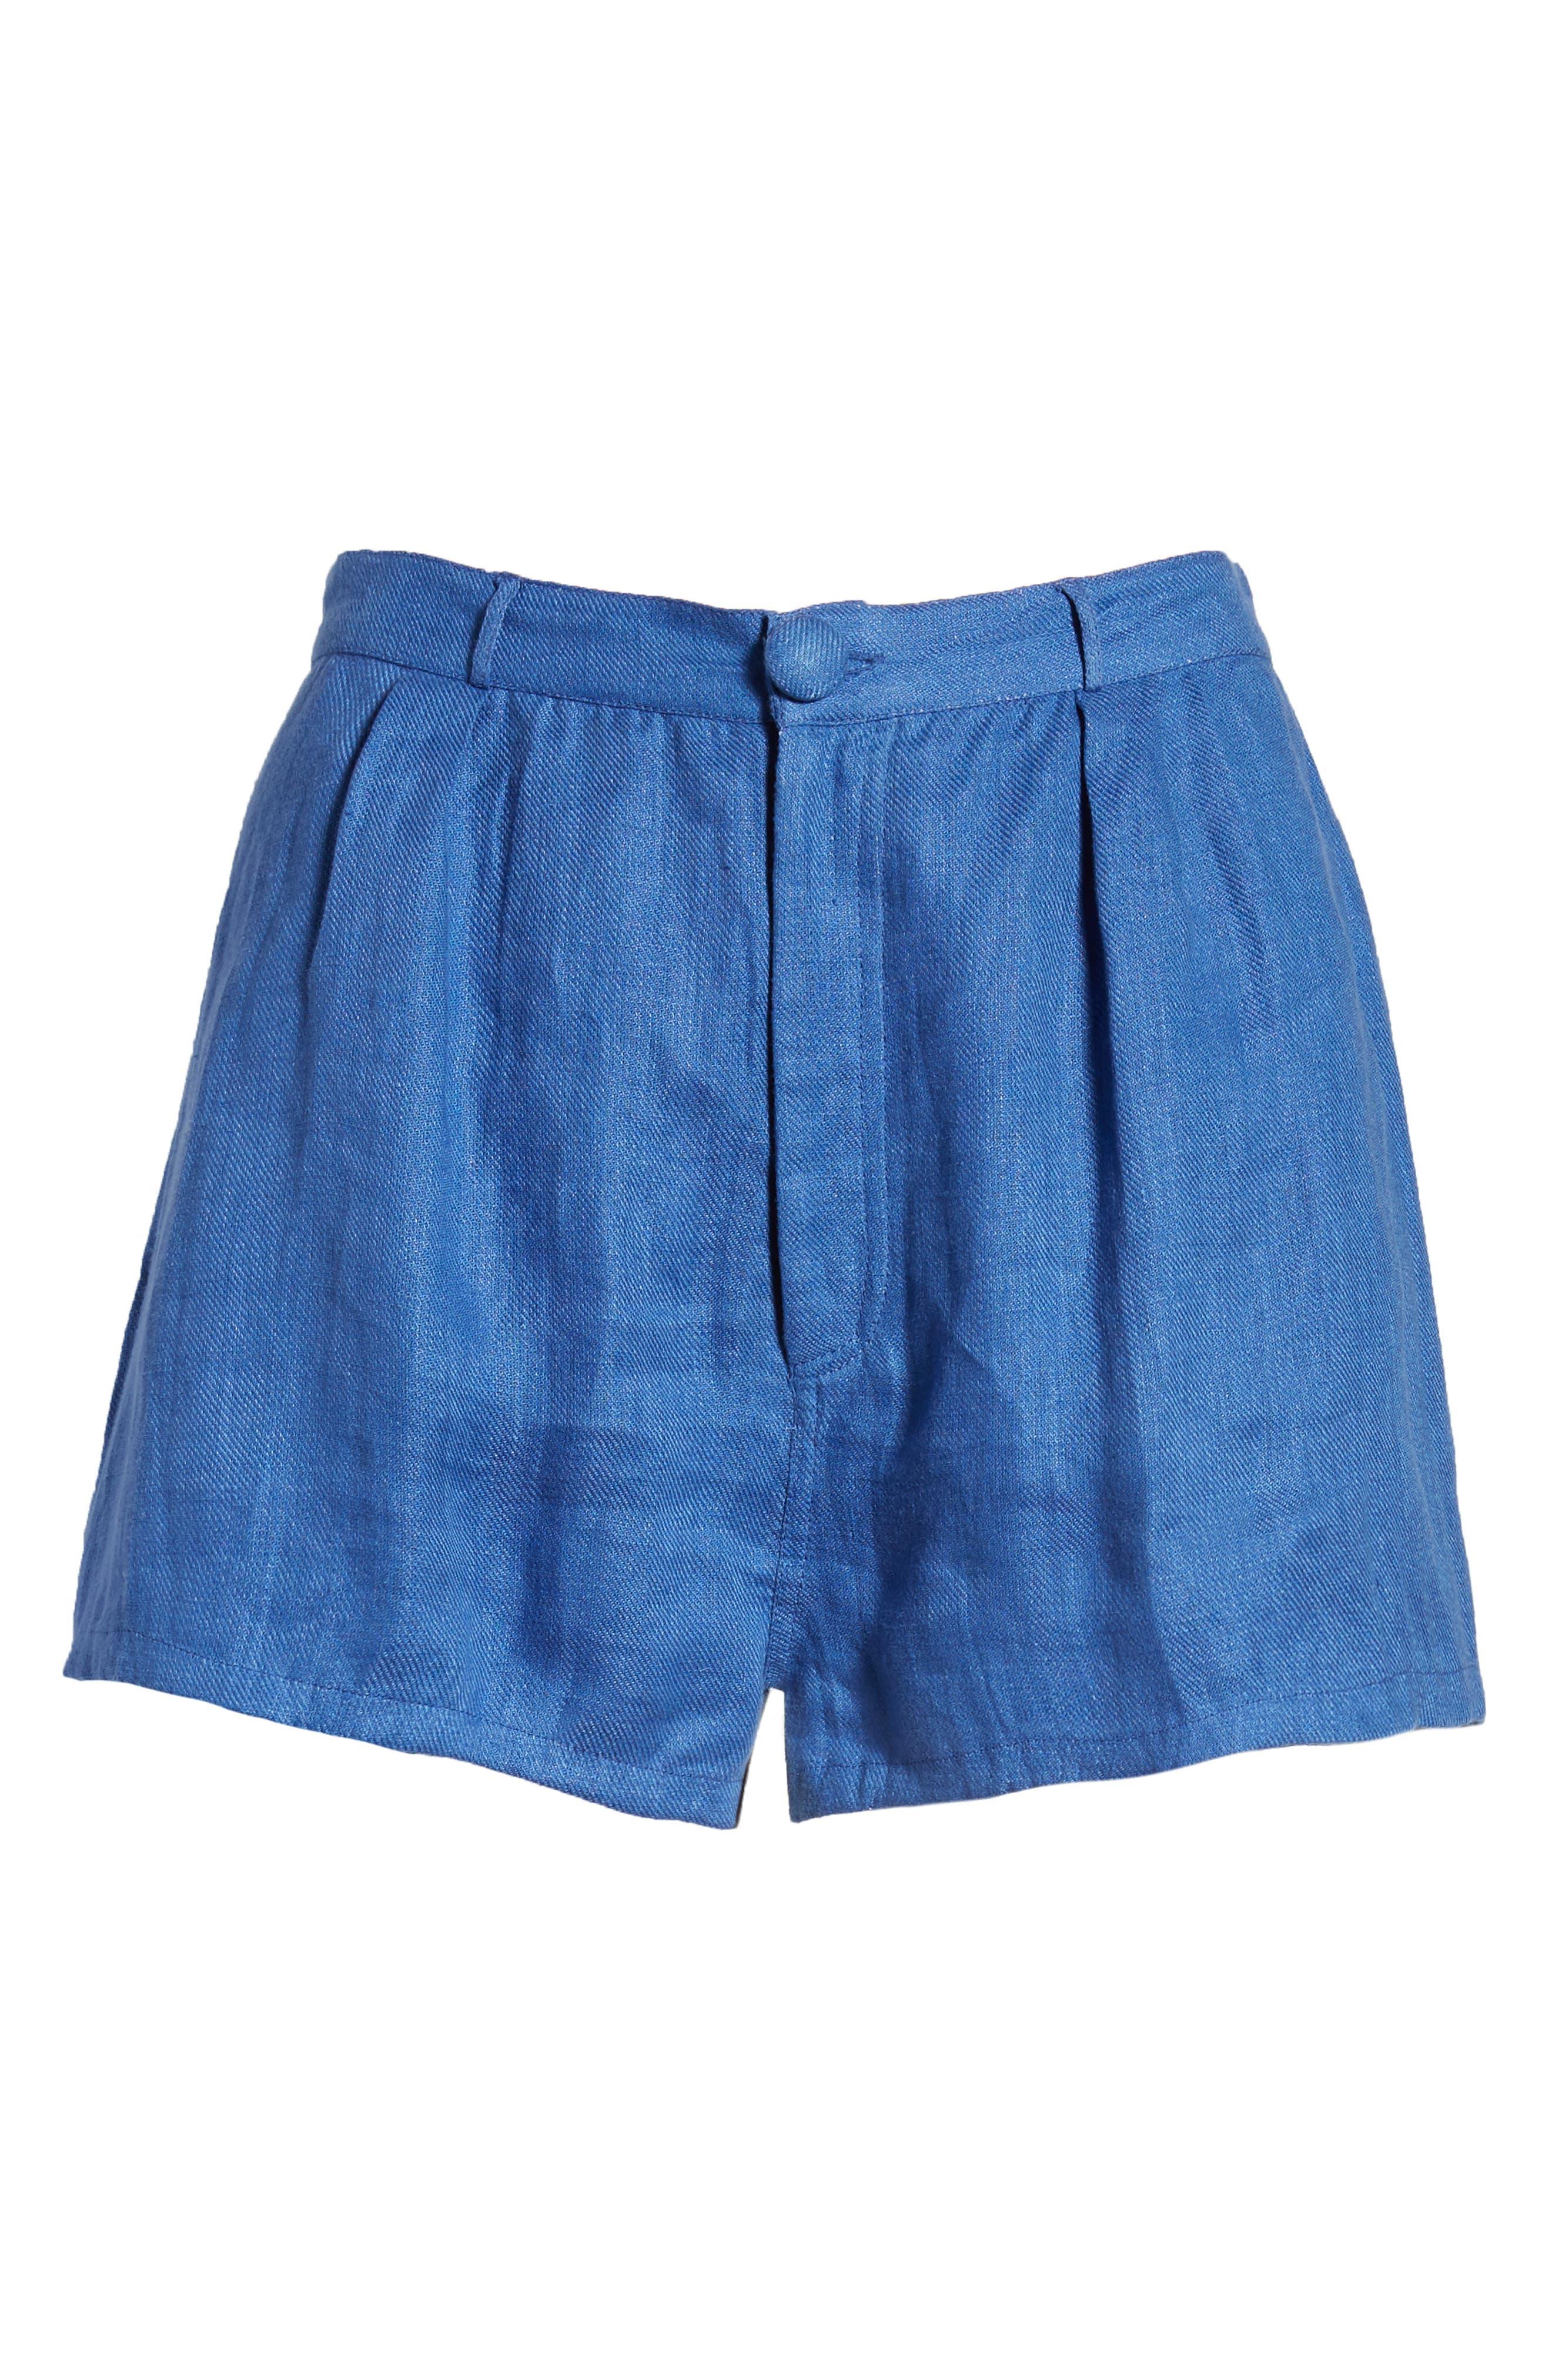 Jordy High Waist Shorts,                             Alternate thumbnail 7, color,                             Blue